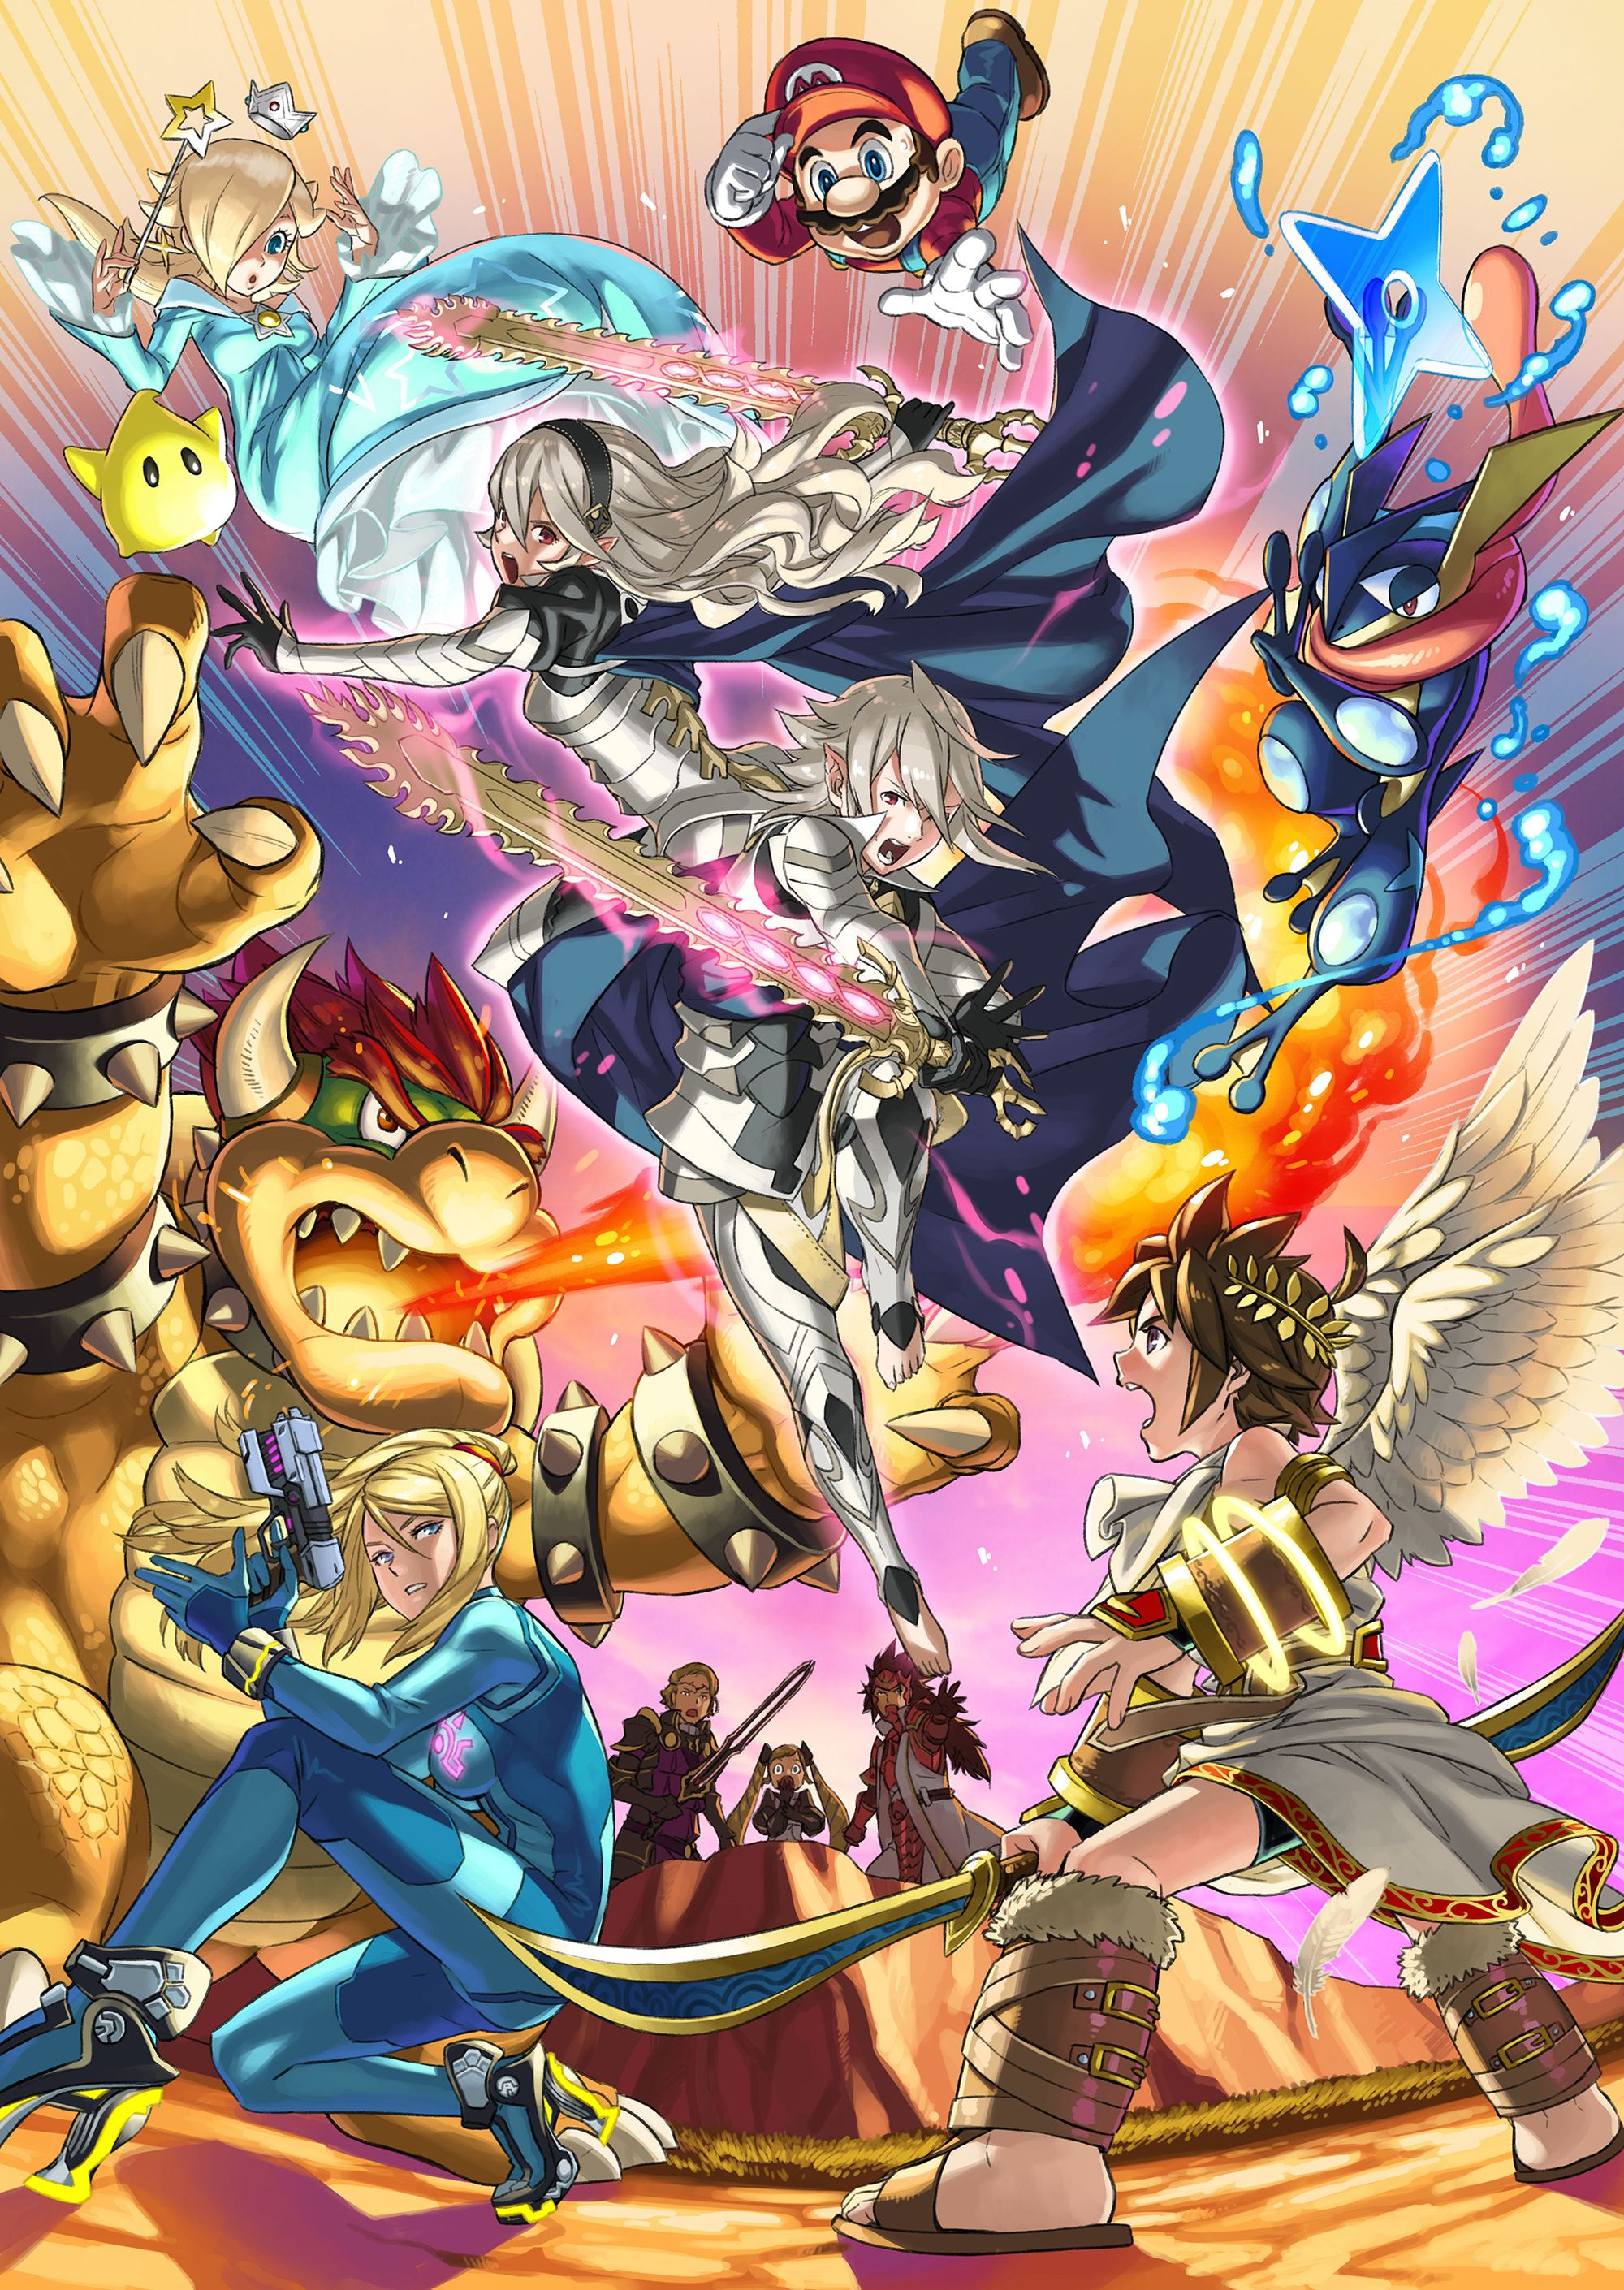 Super Smash Bros Wii U 3DS Fire Emblem Fates Pokemon Metroid Kid Icarus